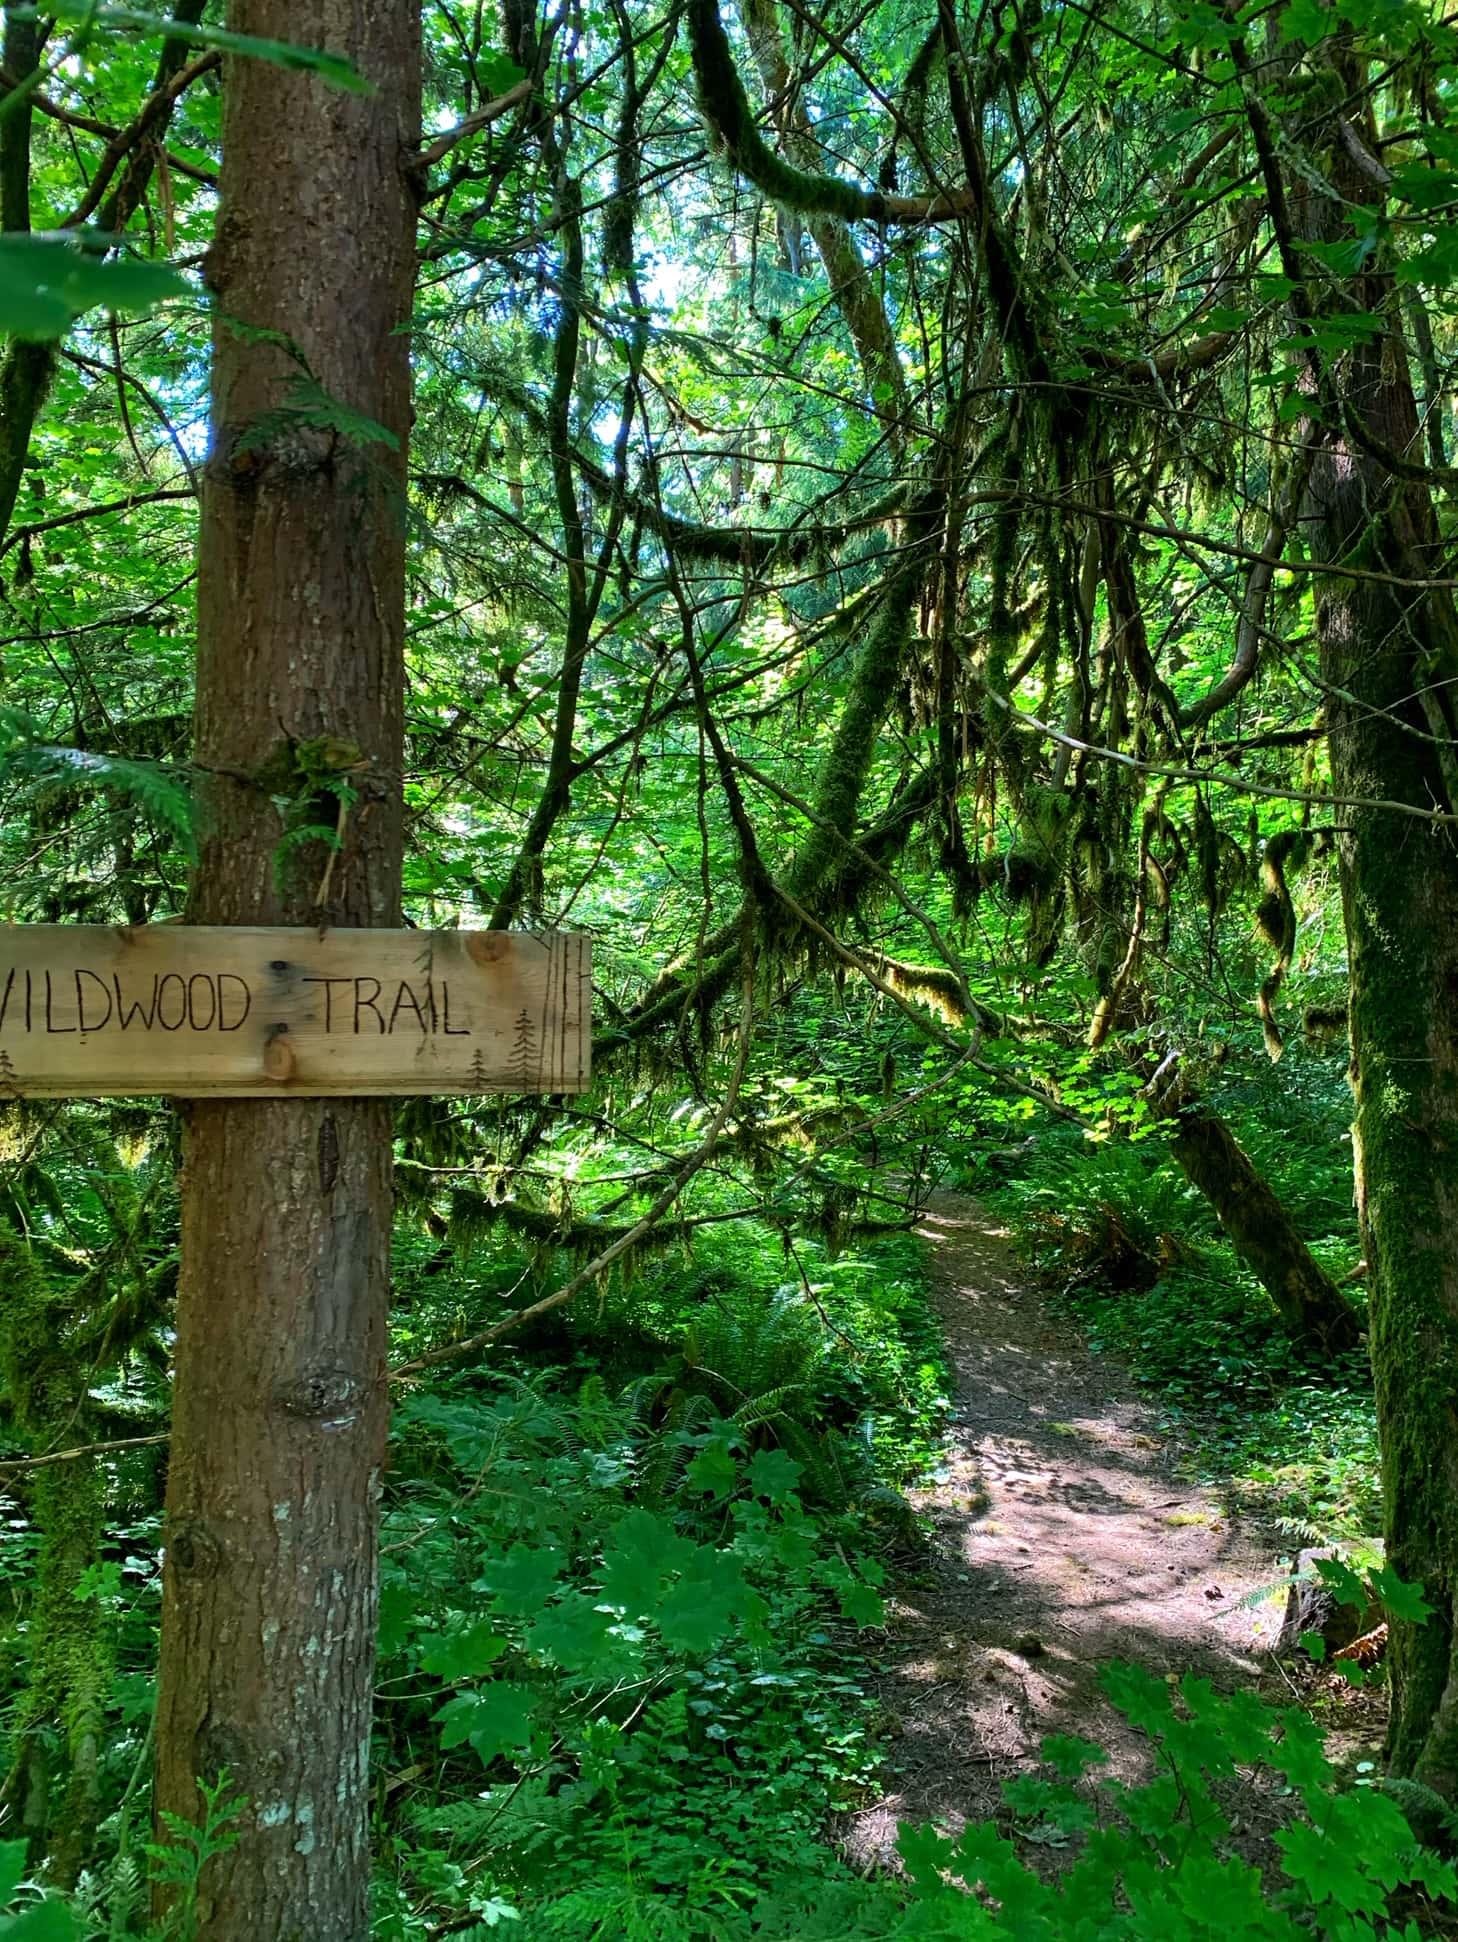 hiking trails at mt hood village